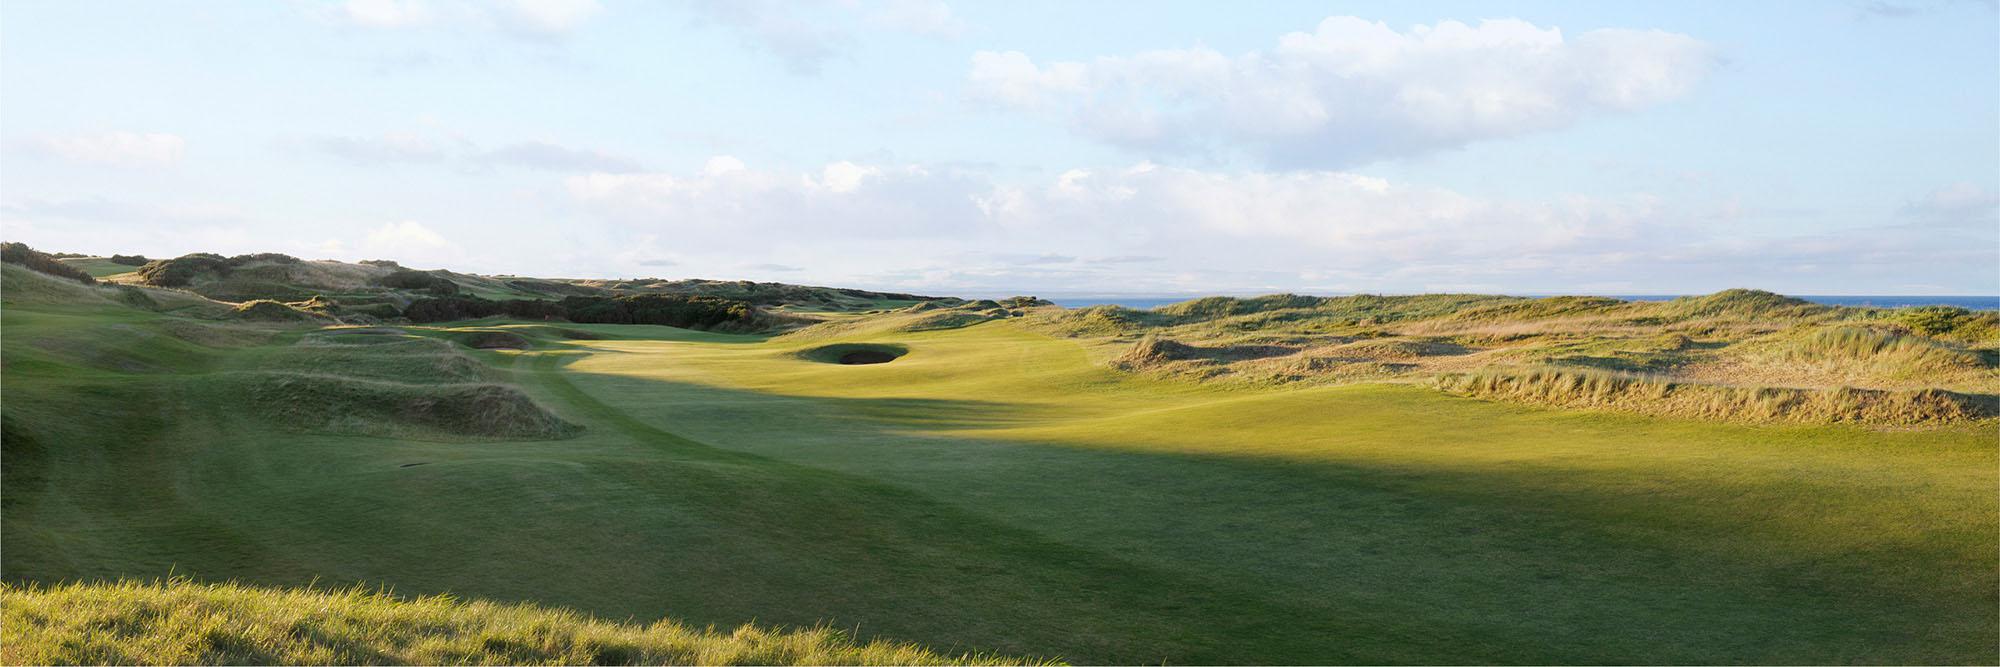 Golf Course Image - Kingsbarns No. 16